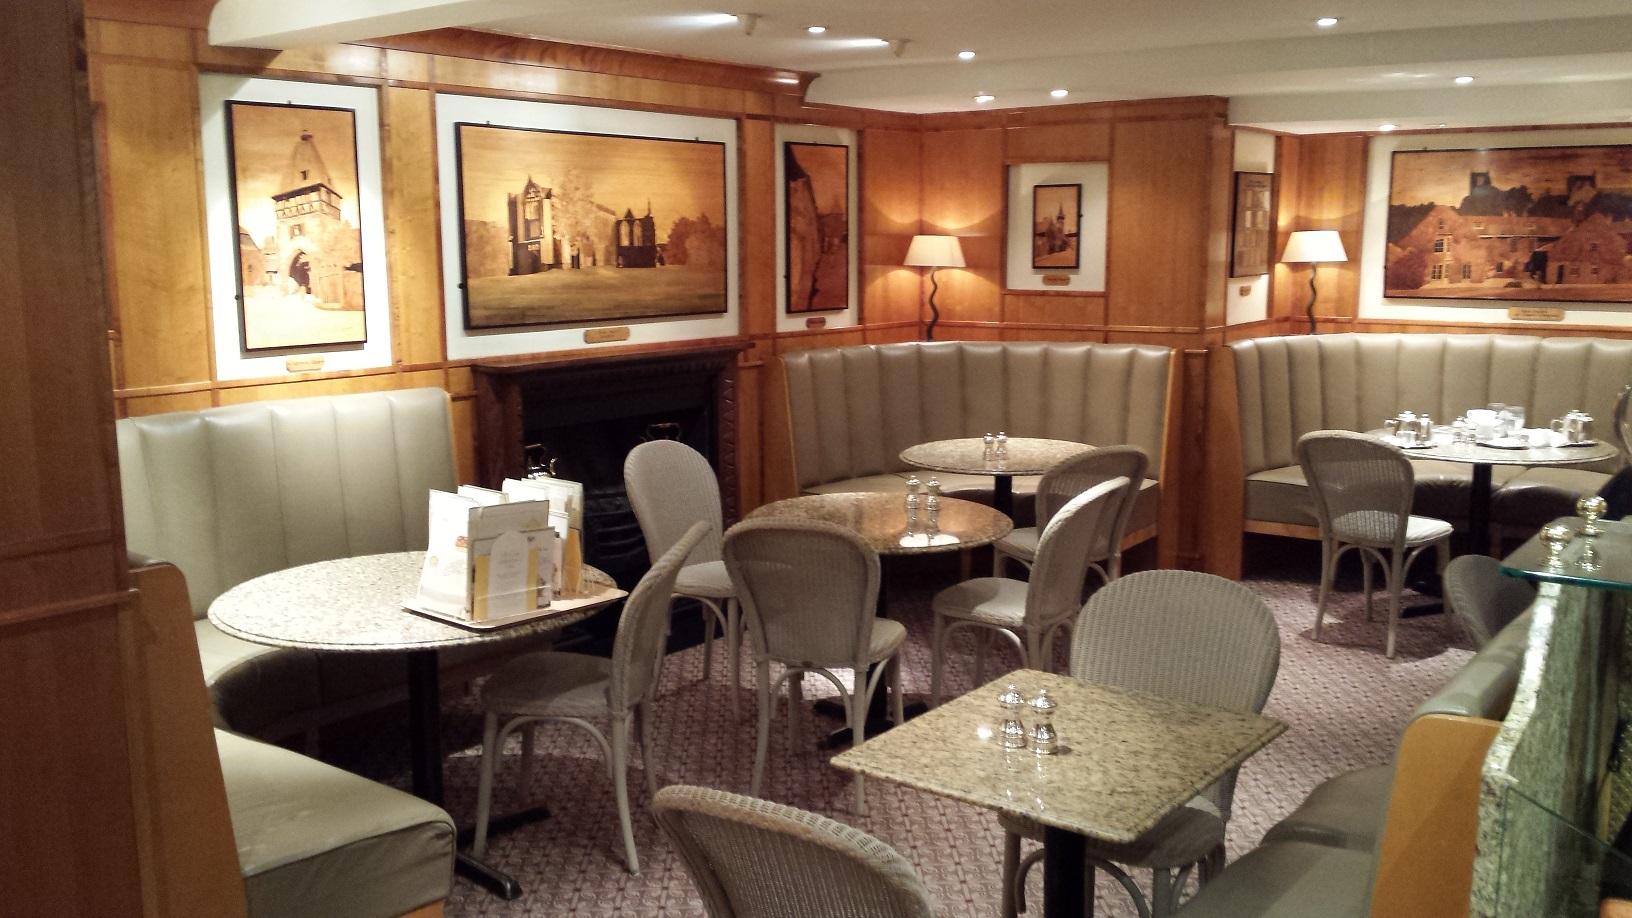 The interior of Bettys Tea Rooms in Harrogate